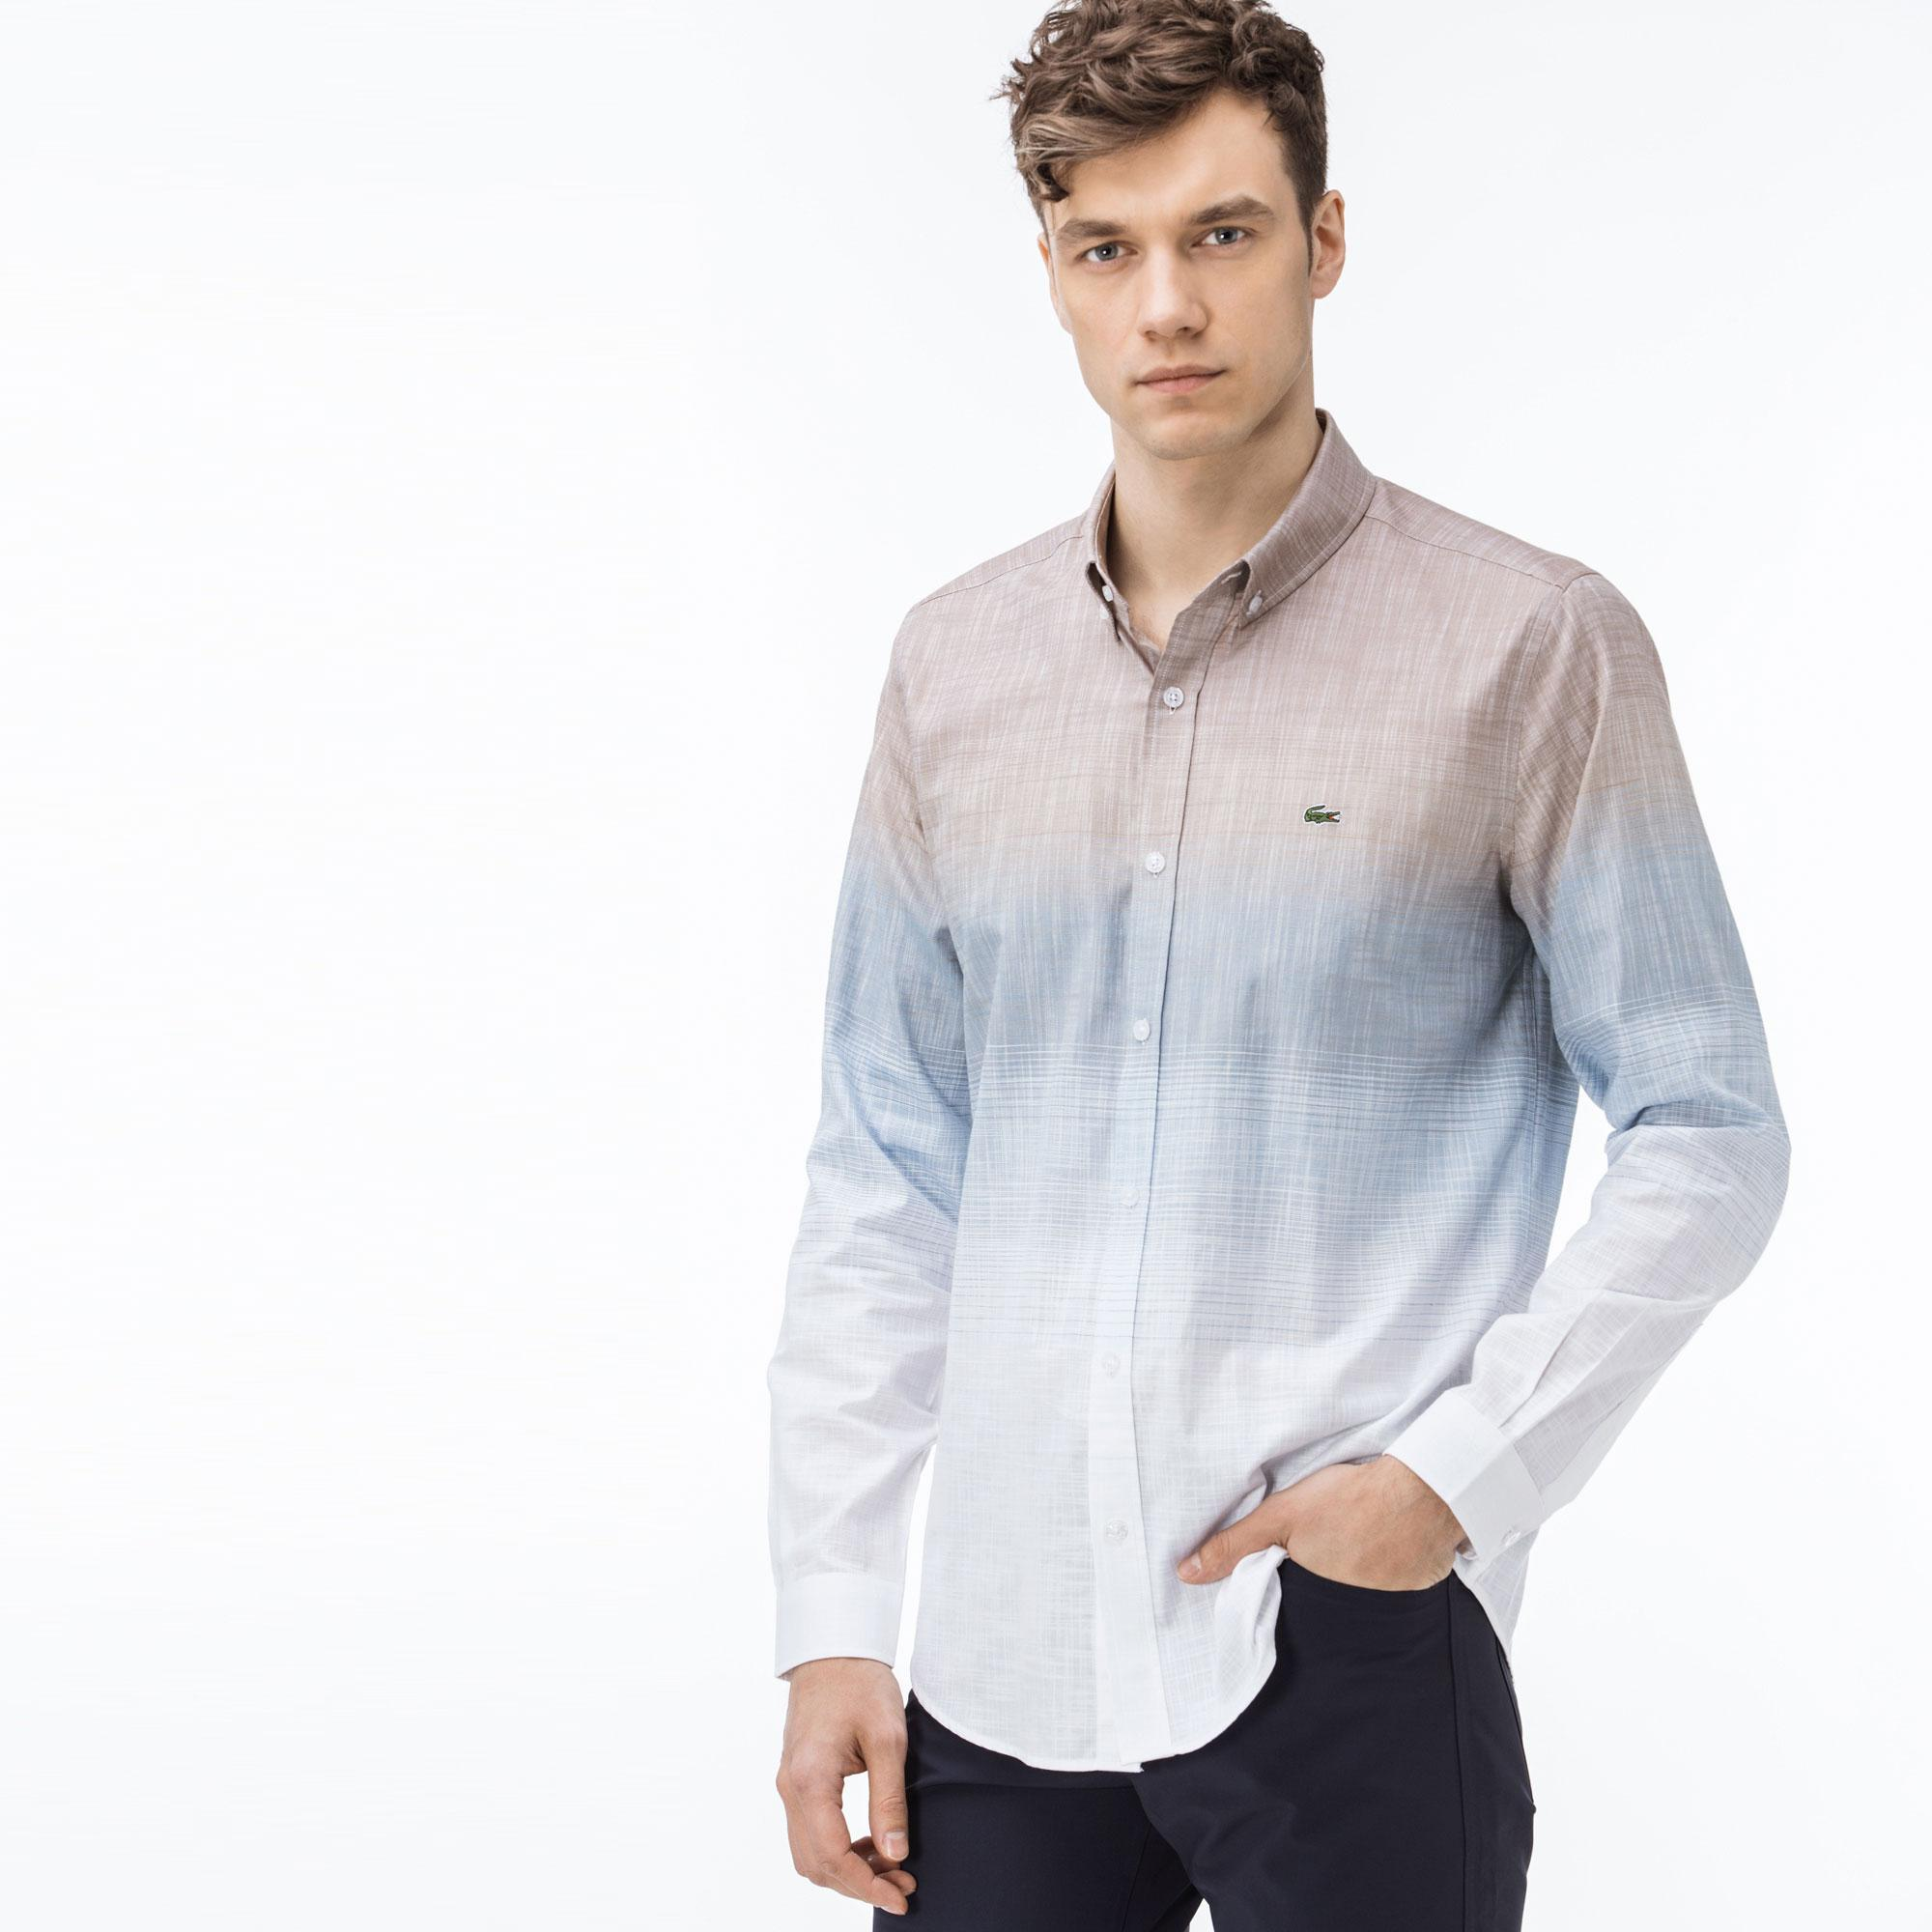 Lacoste Erkek Slim Fit Renkli Degrade Gömlek